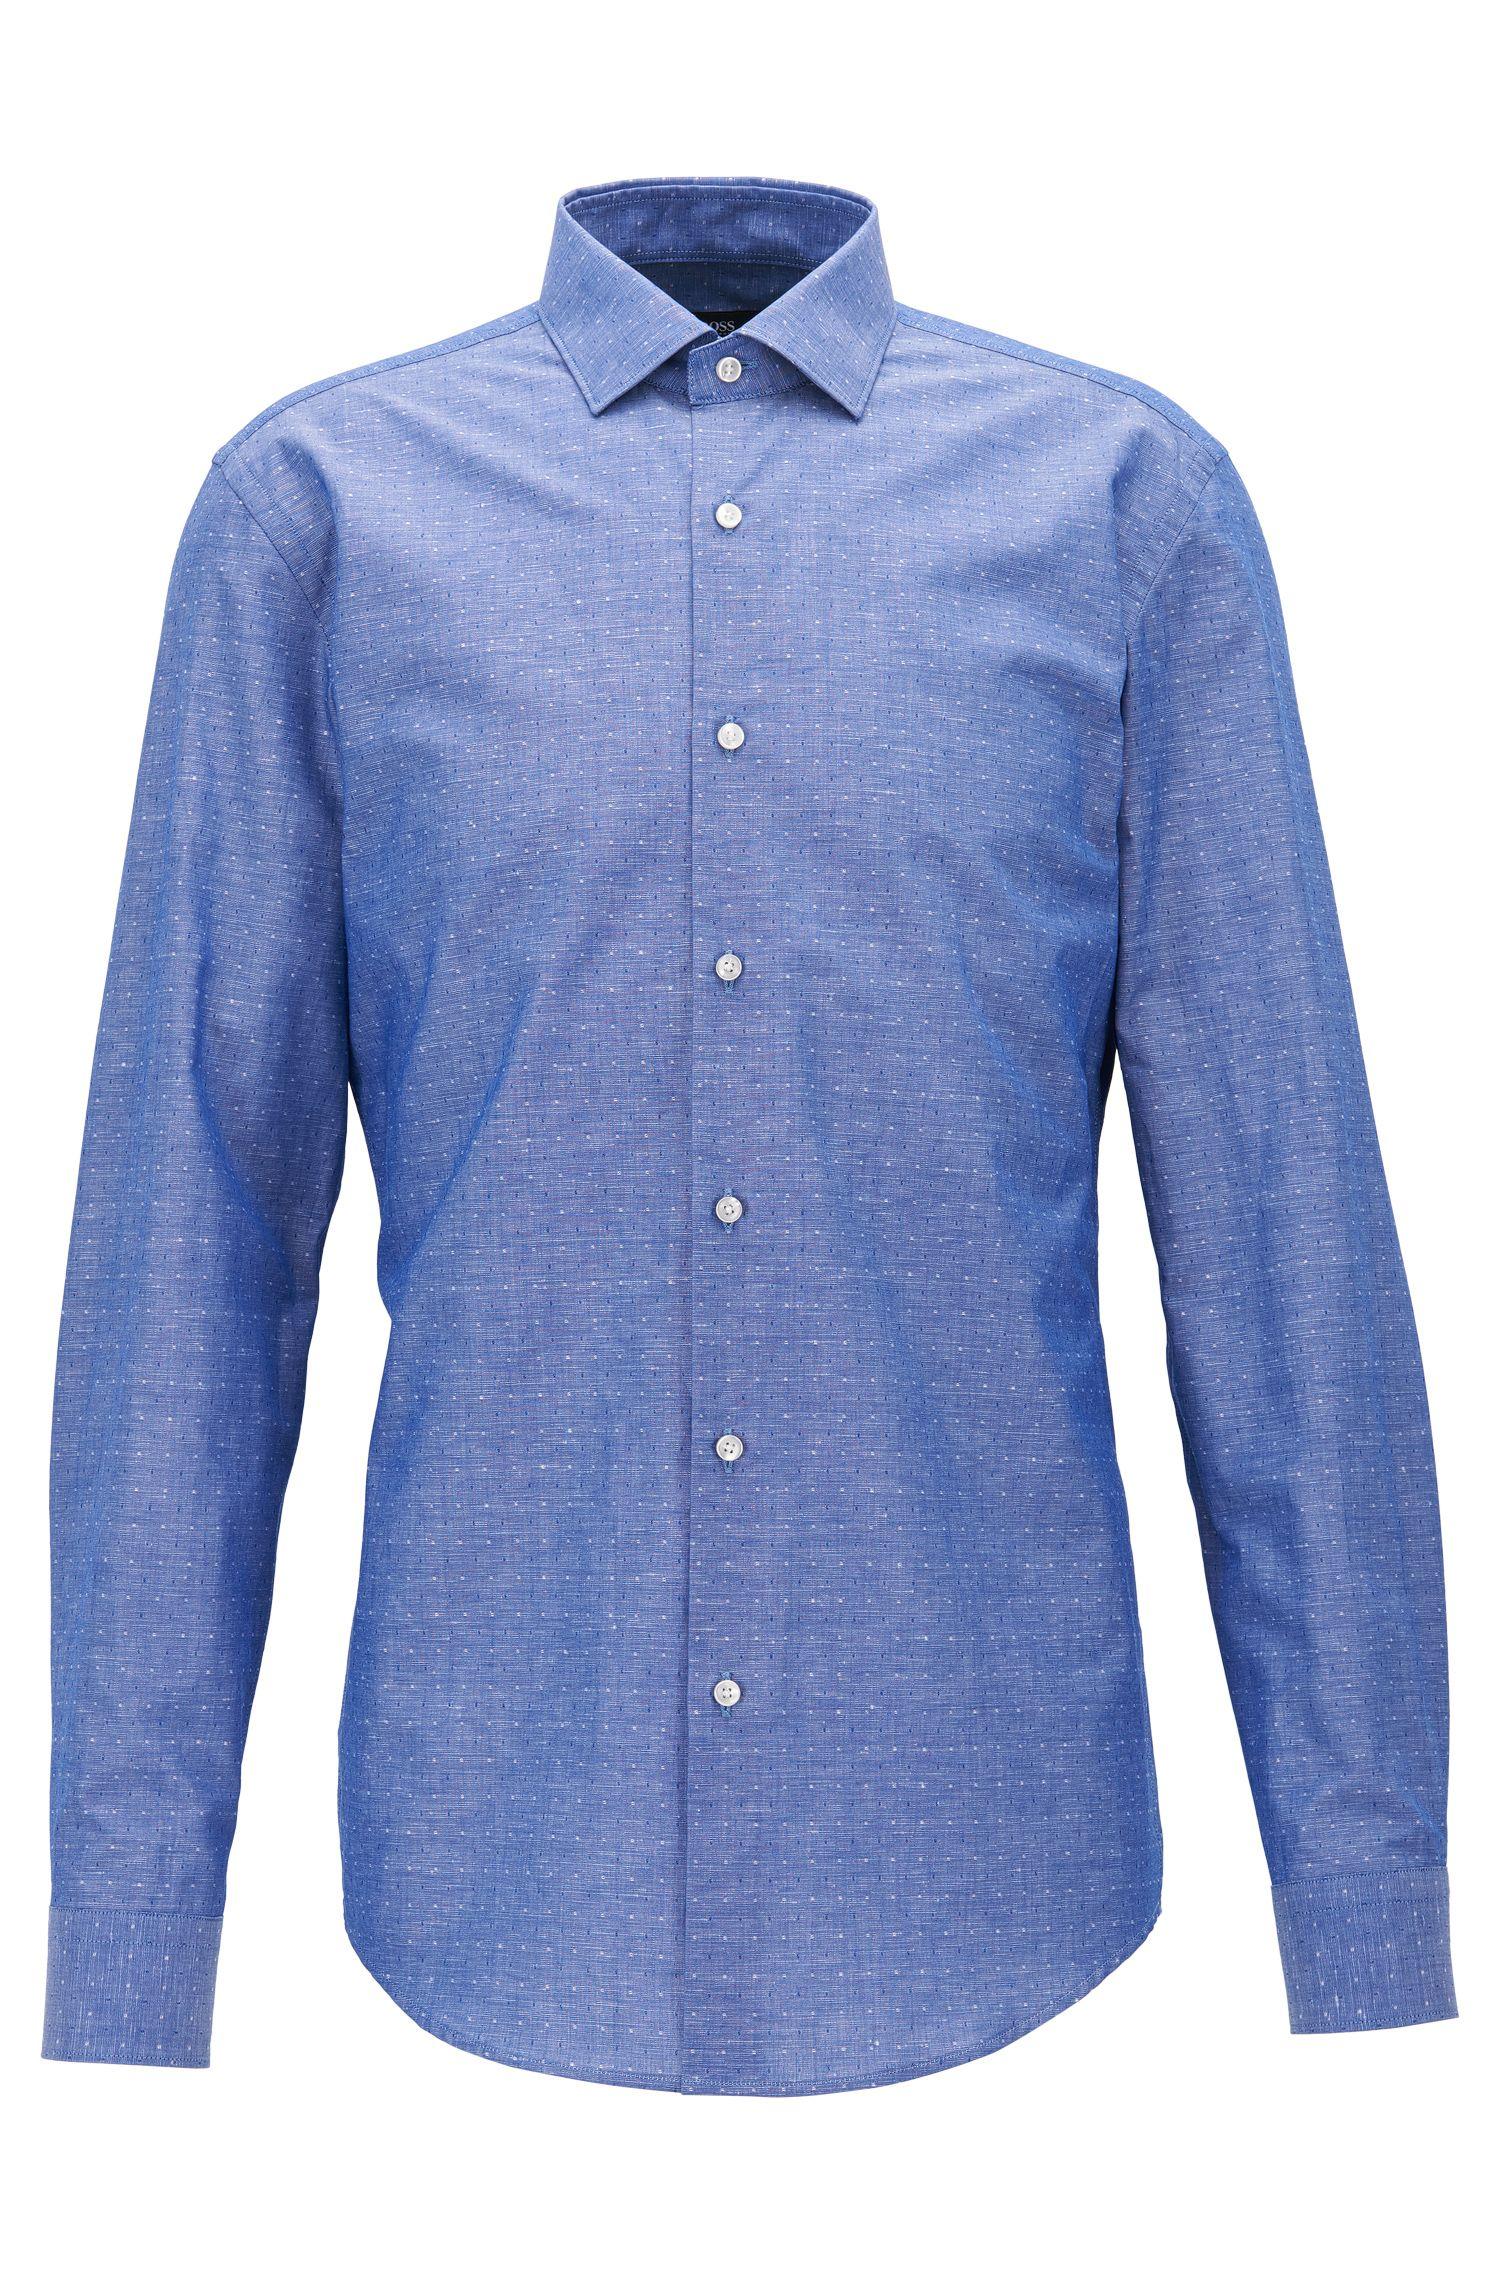 Cotton Linen Dress Shirt, Slim Fit | Ismo